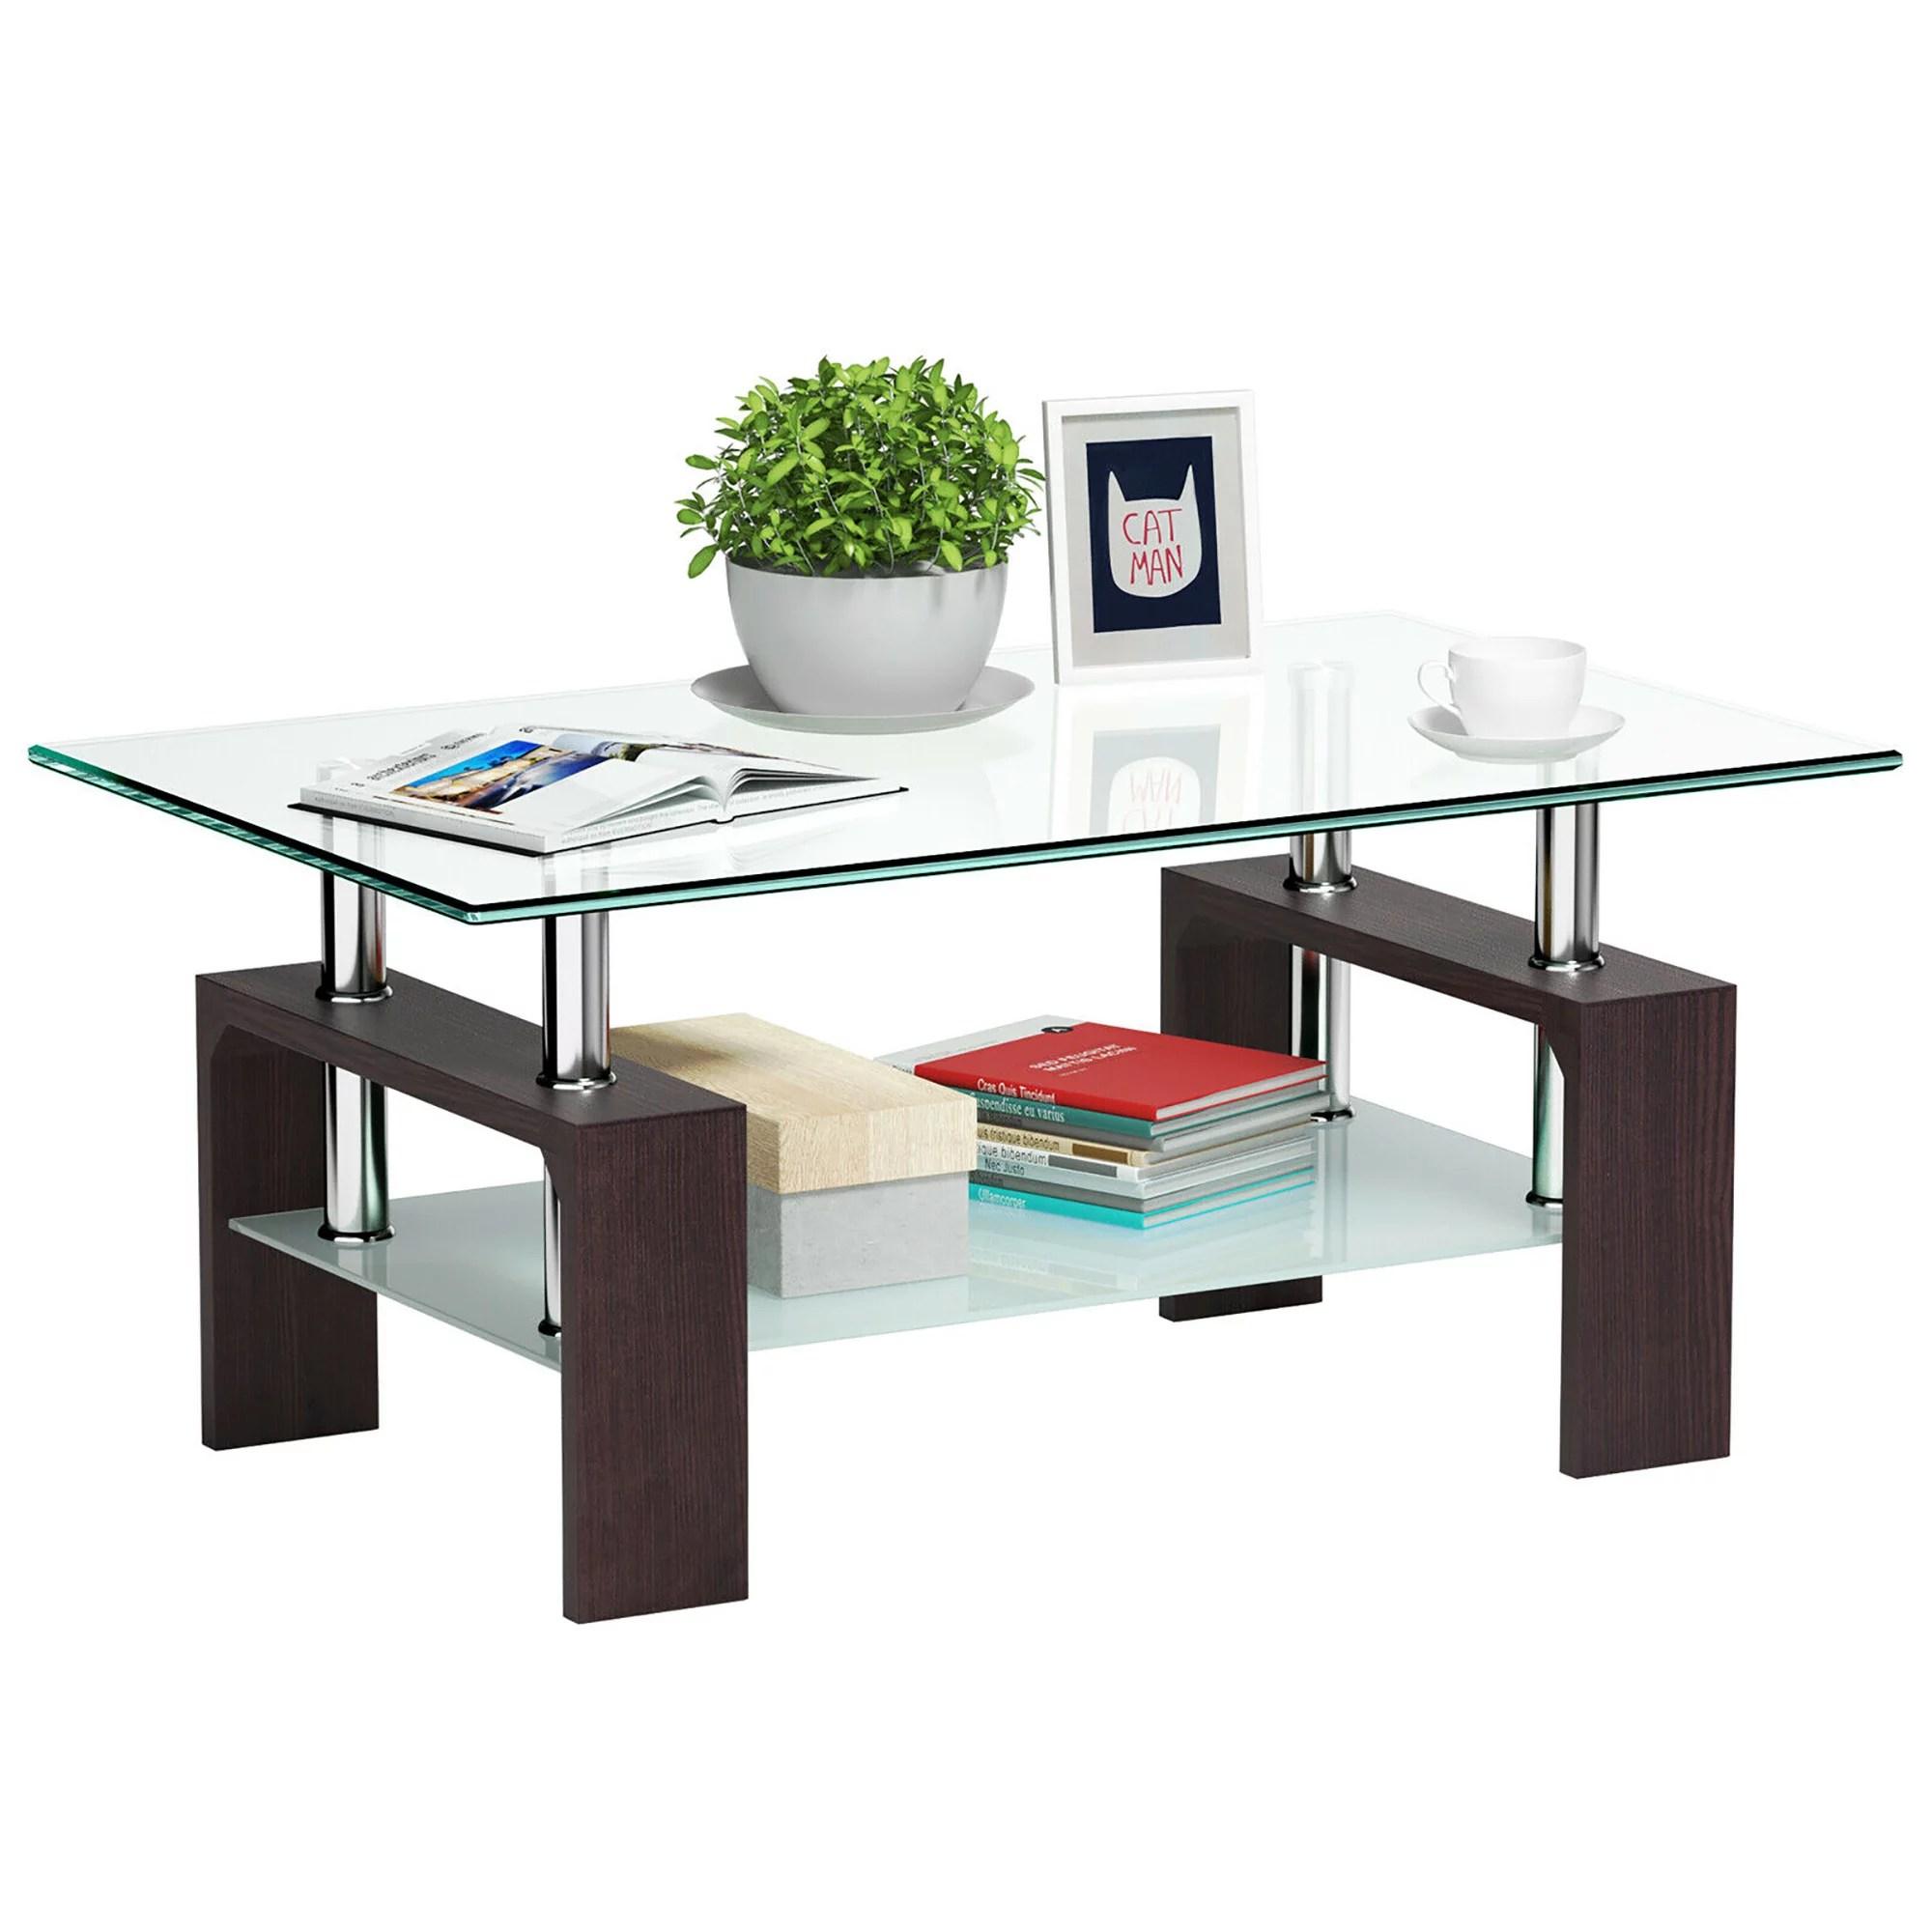 costway rectangular wood tempered glass top coffee table w storage shelf